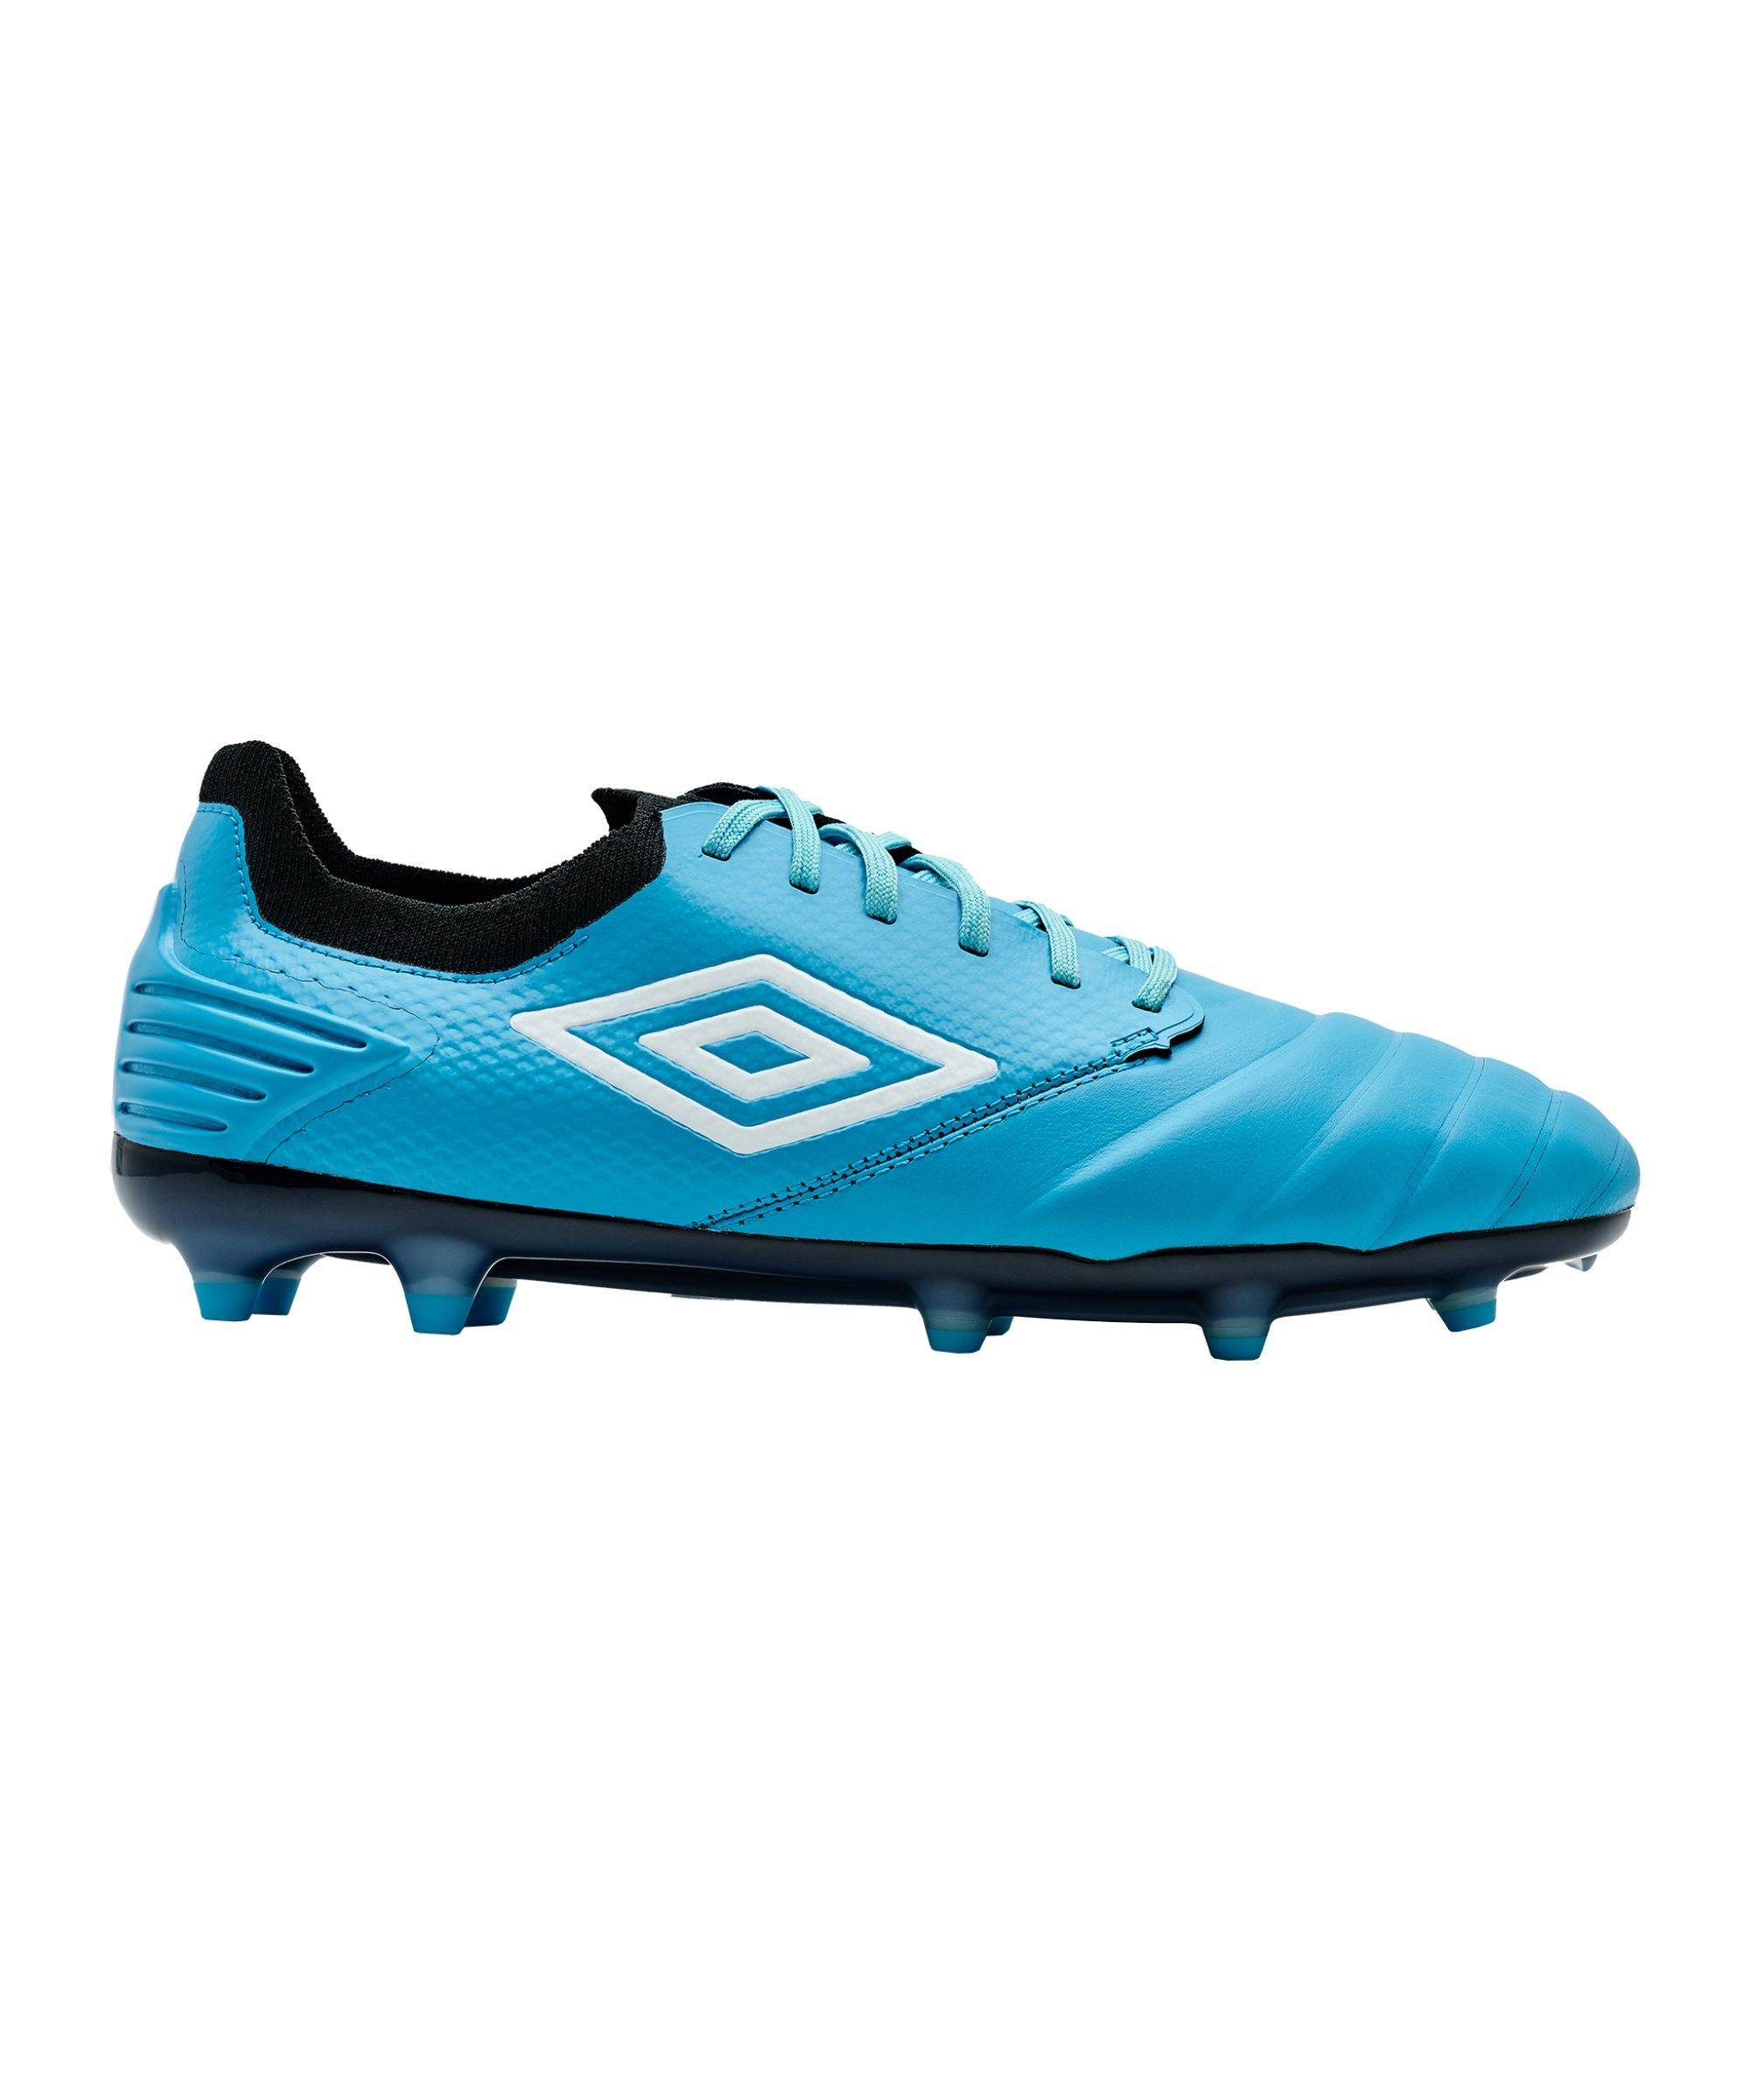 Umbro Tocco Pro FG Blau Weiss FKE4 - blau